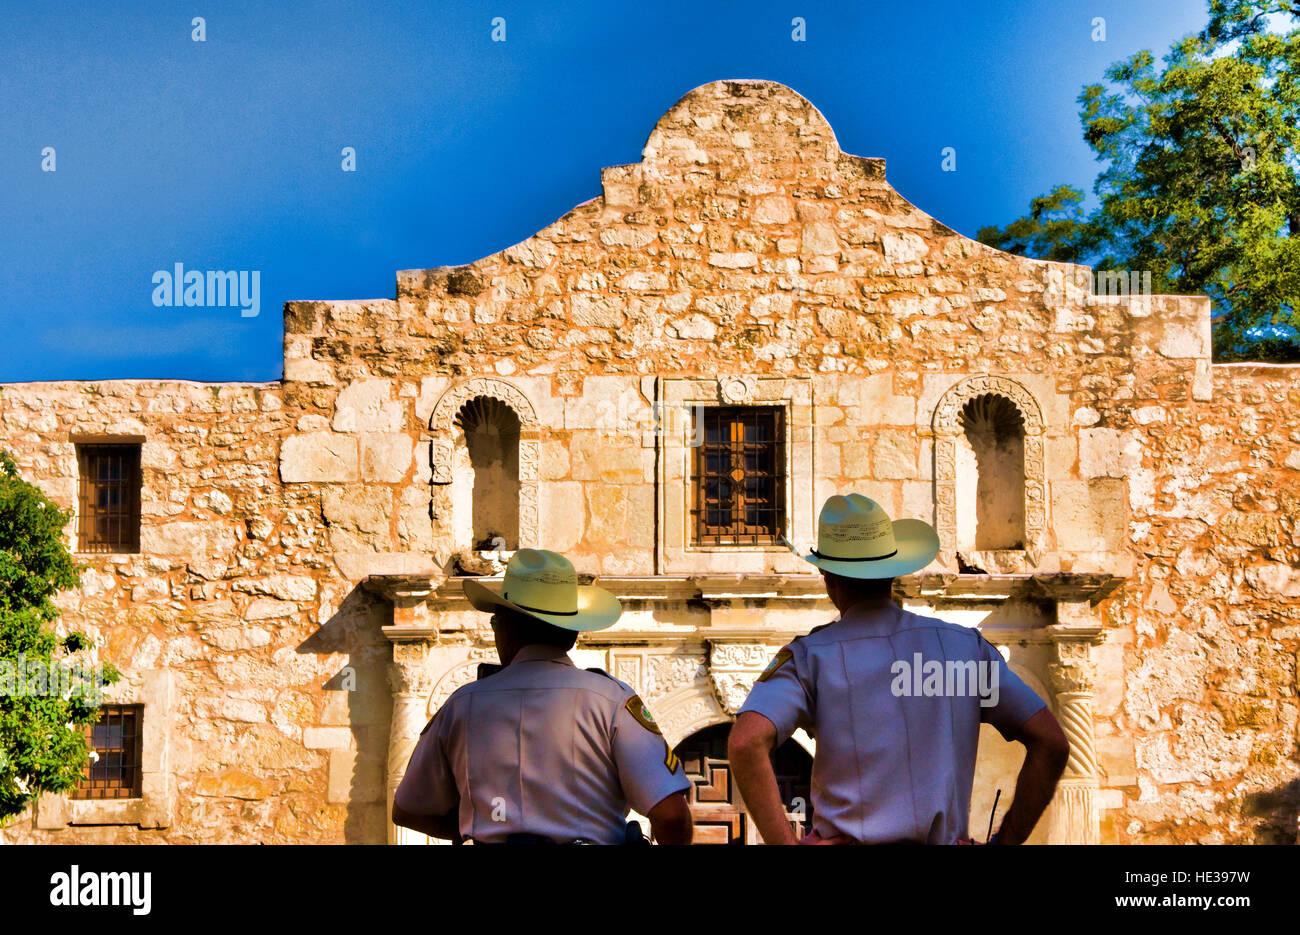 San Antonio Missions, Texas Rangers guarding The Alamo (AKA Mission San Antonio de Valero), State Historic Site - Stock Image